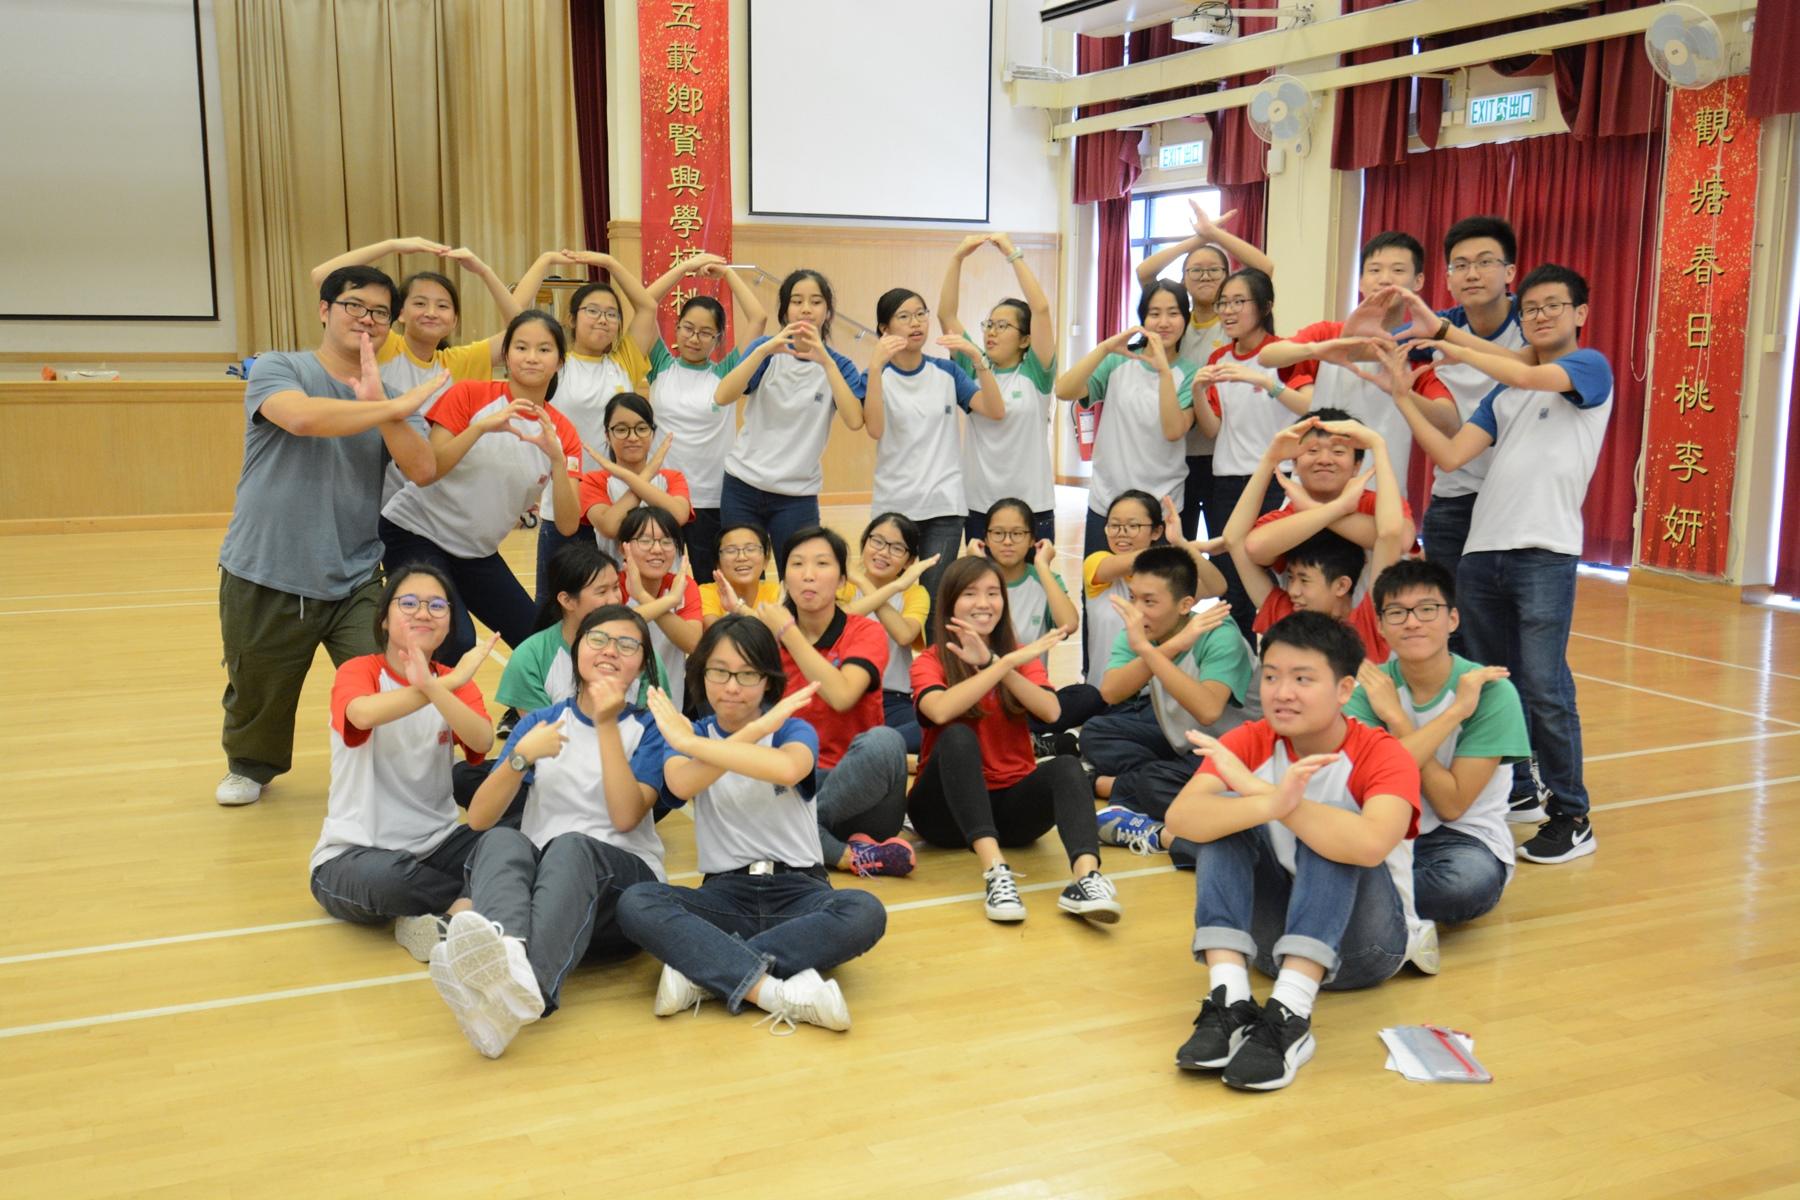 http://npc.edu.hk/sites/default/files/dsc_3492.jpg